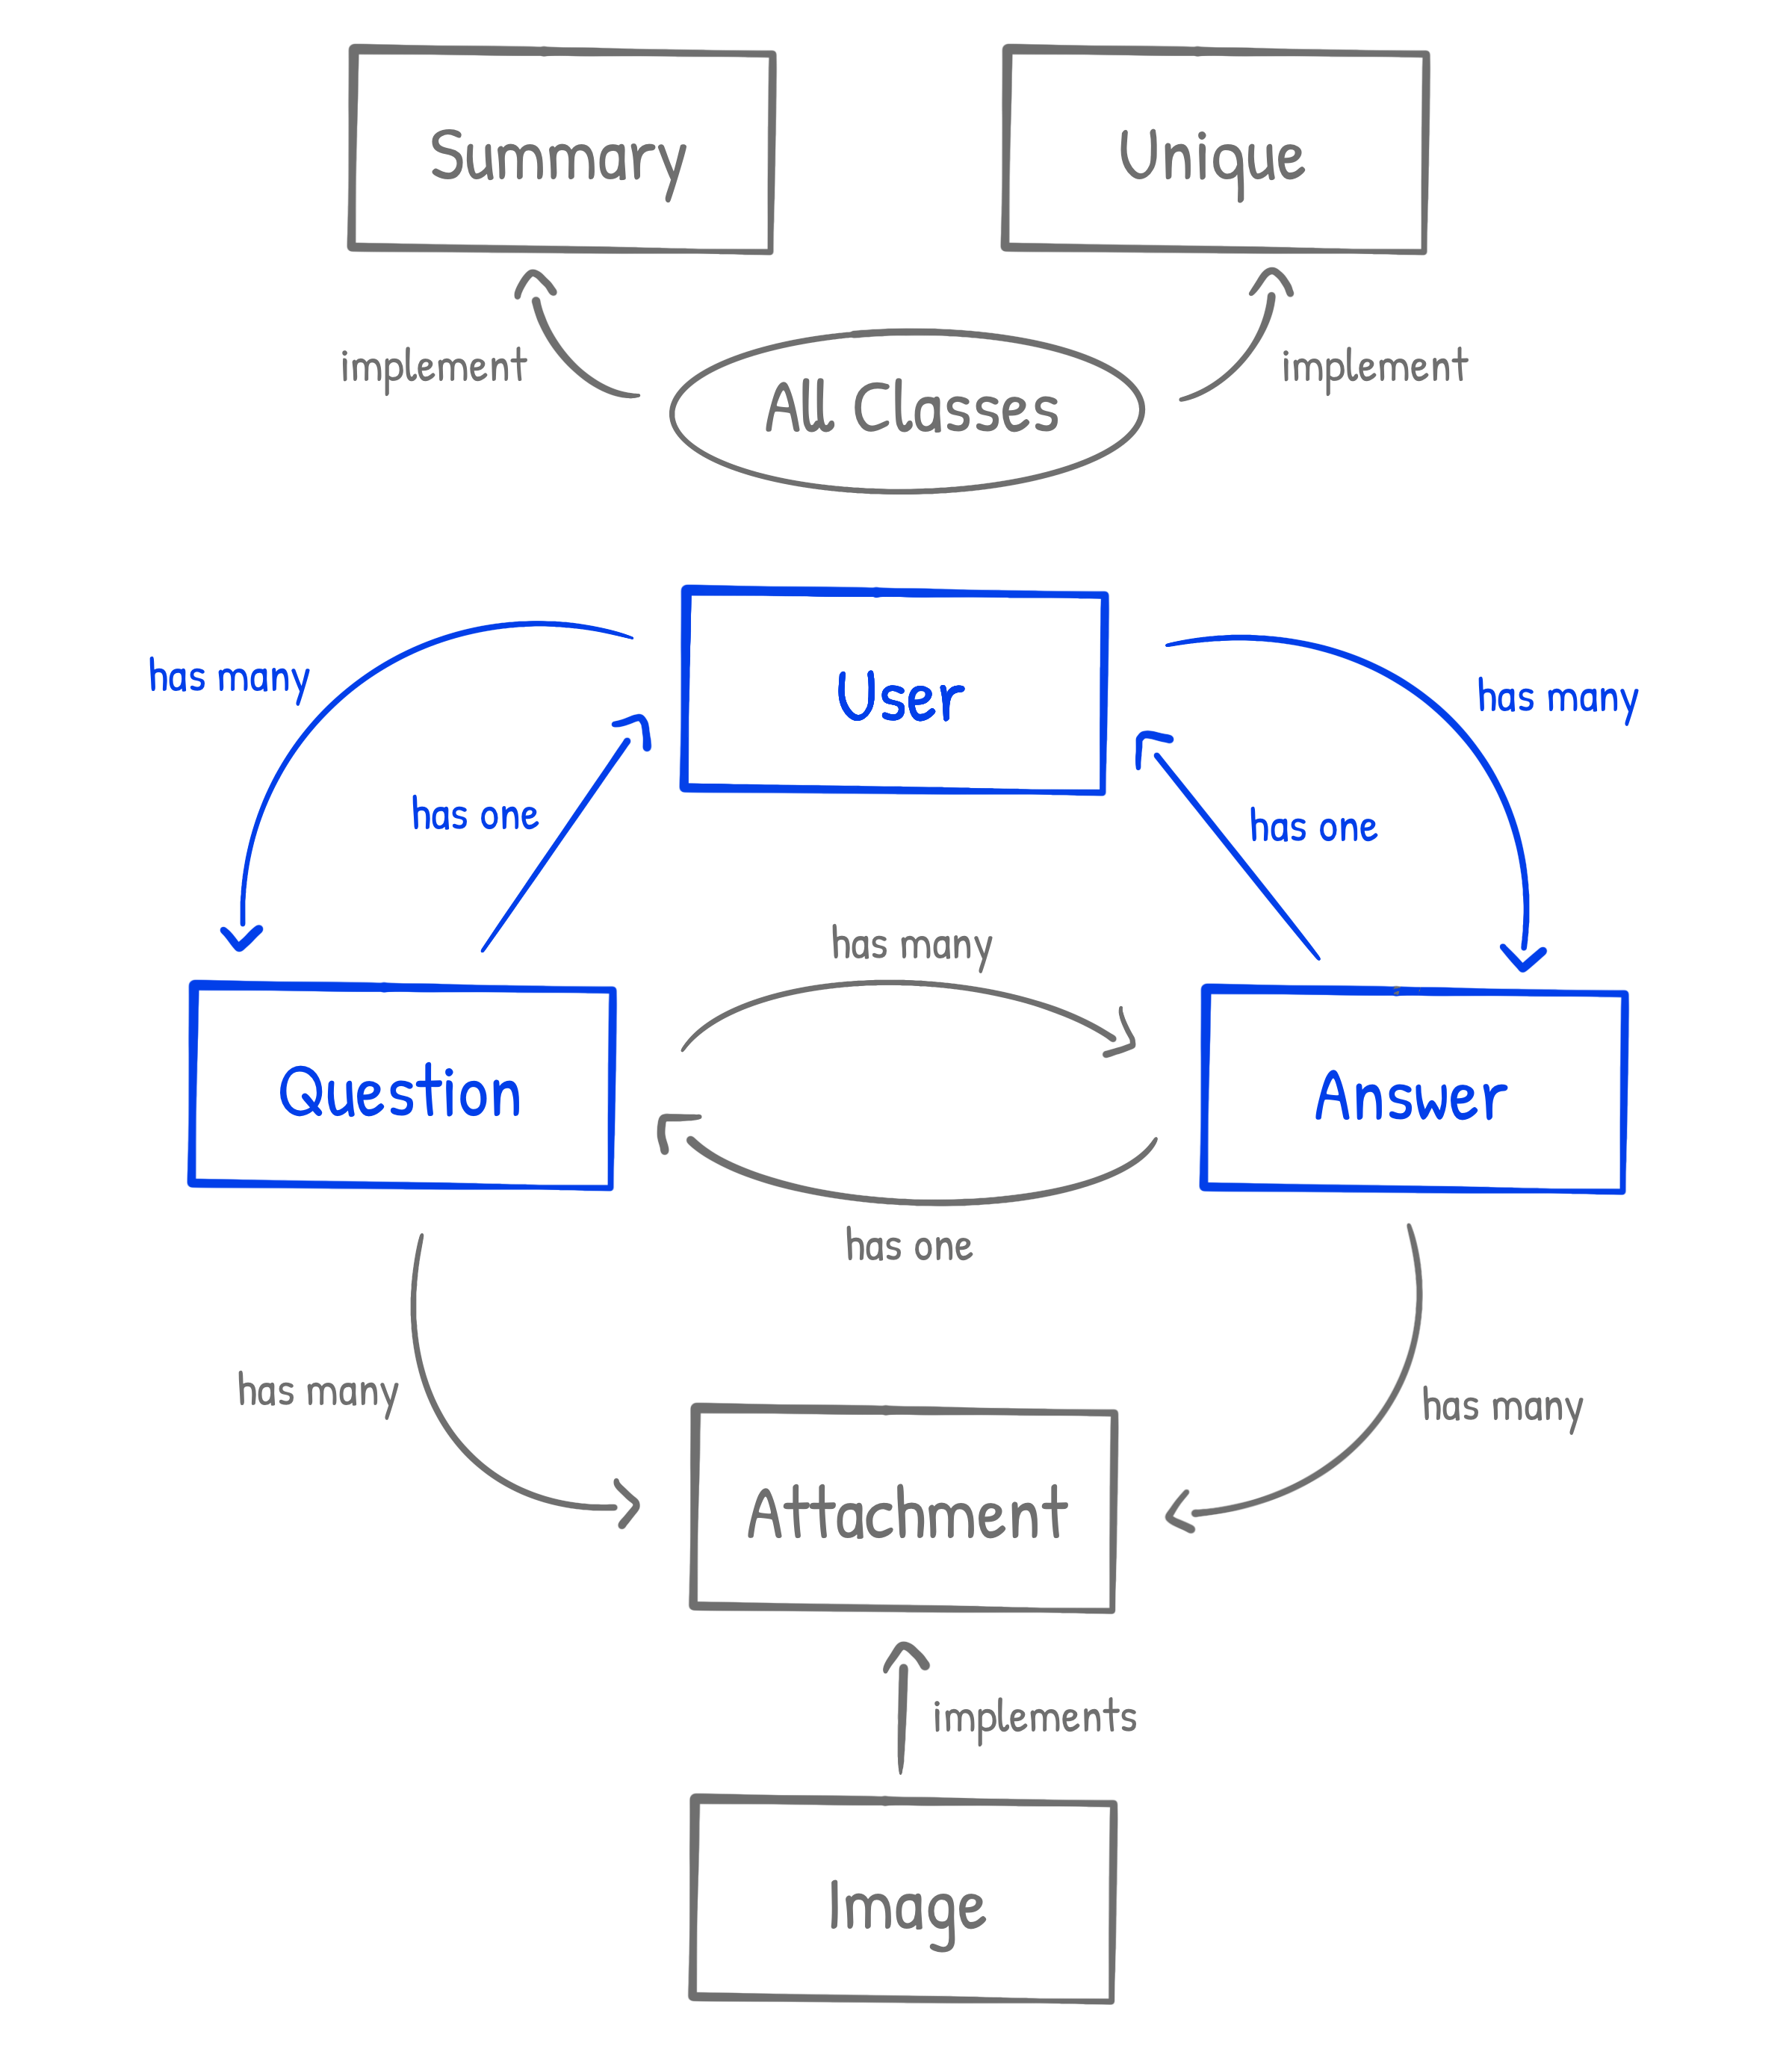 User Class Diagram